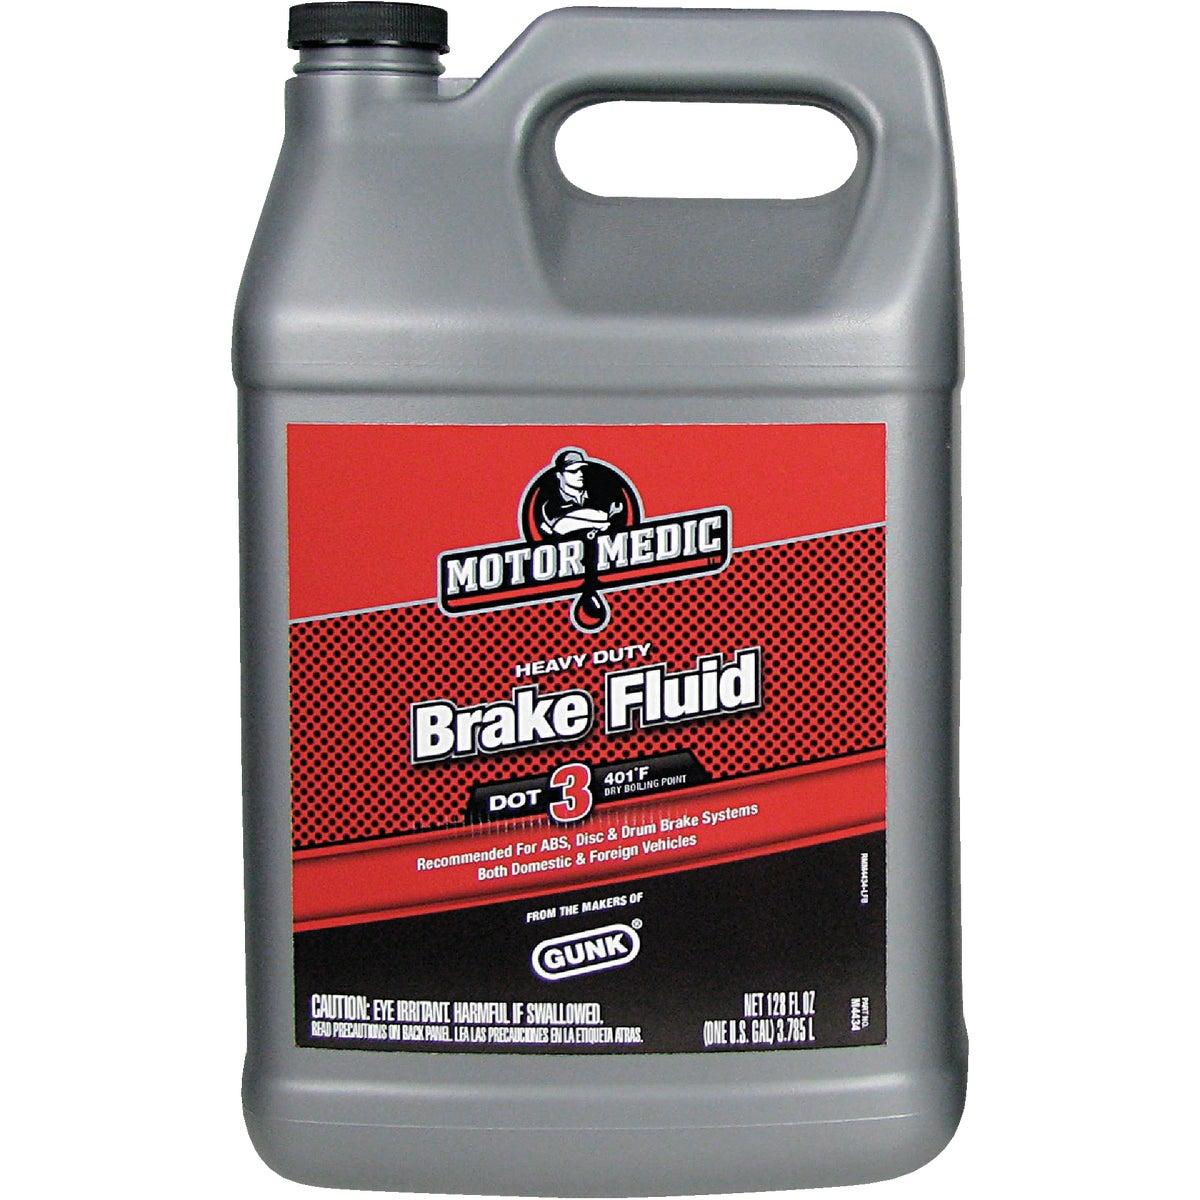 Gal Brake Fluid